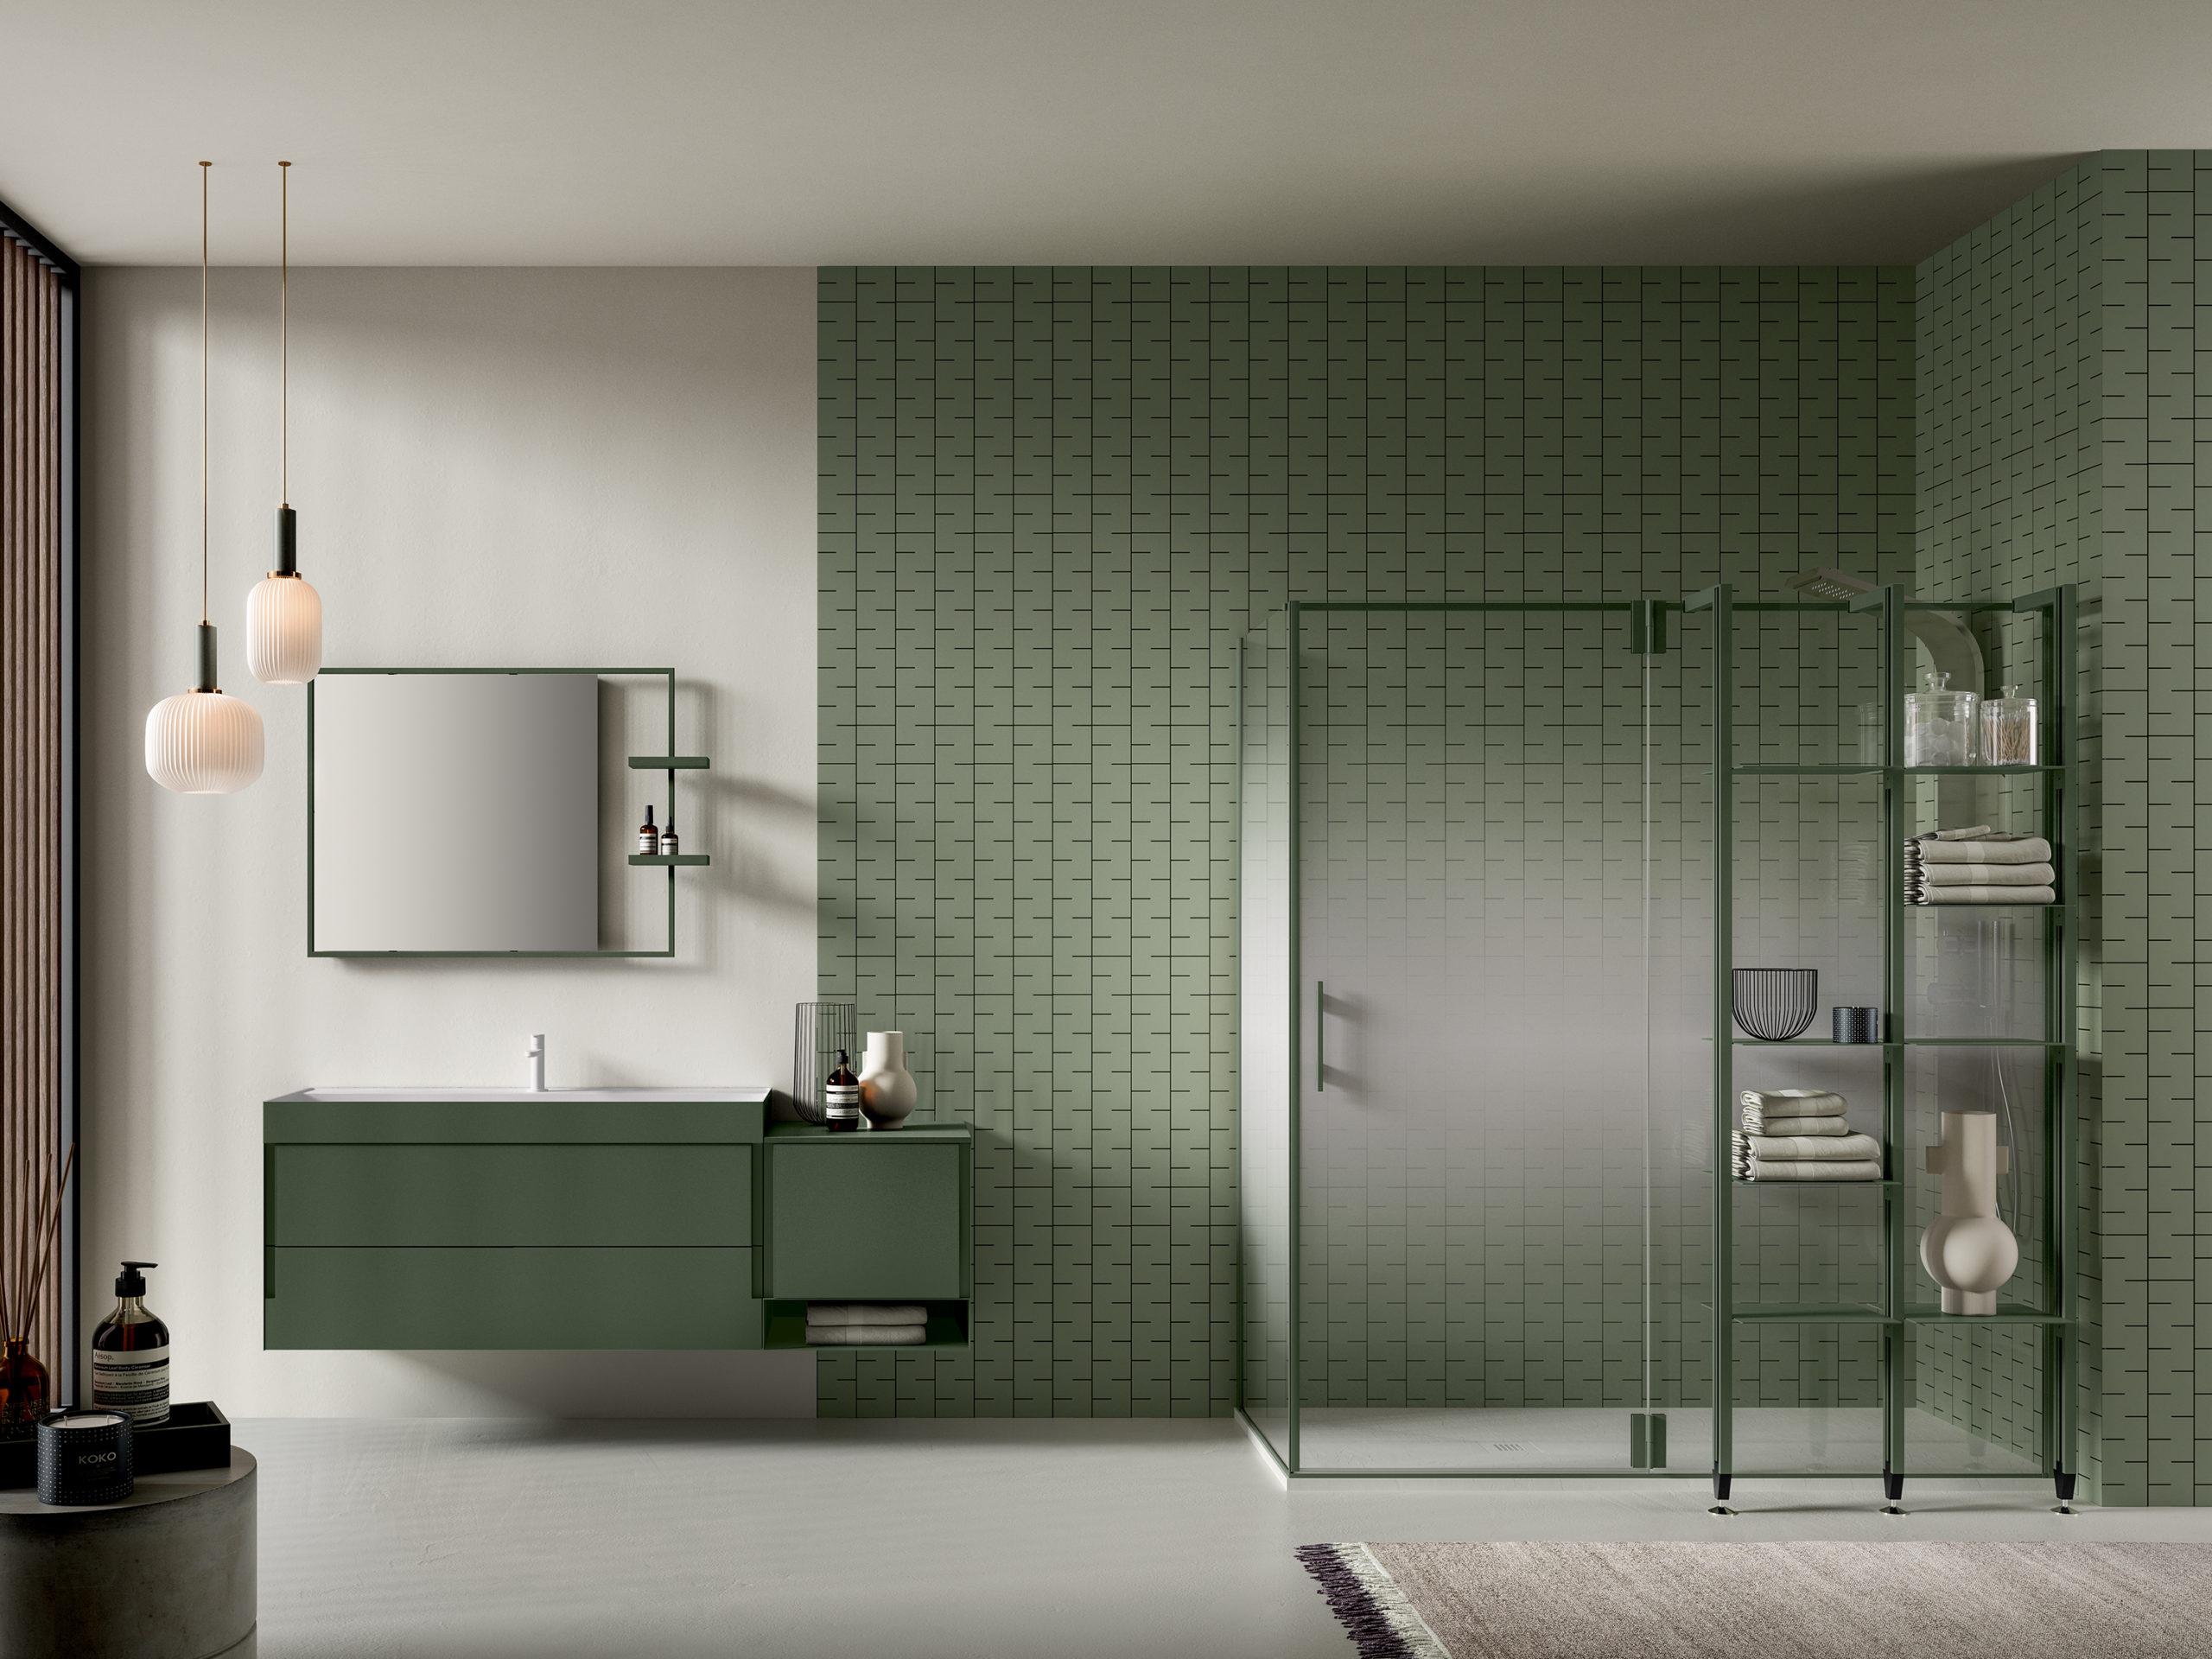 Artesi | Filo+: the custom-made bathroom furniture, for the Contract